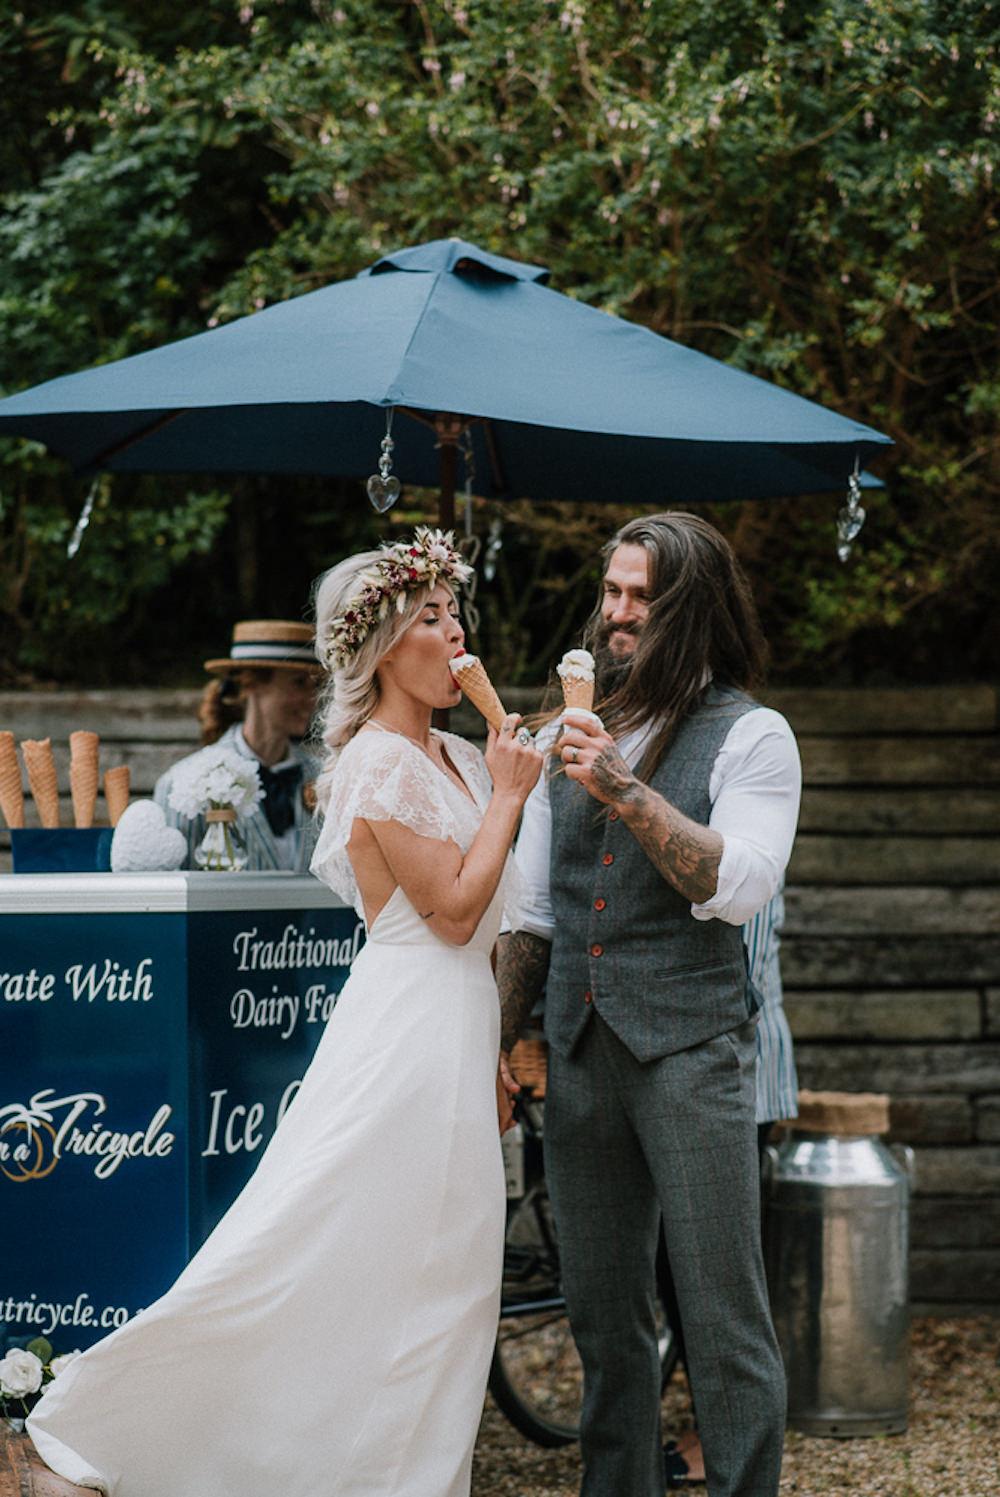 Ice Cream Trike Stand Cart Unconventional Wedding Ideas Pierra G Photography